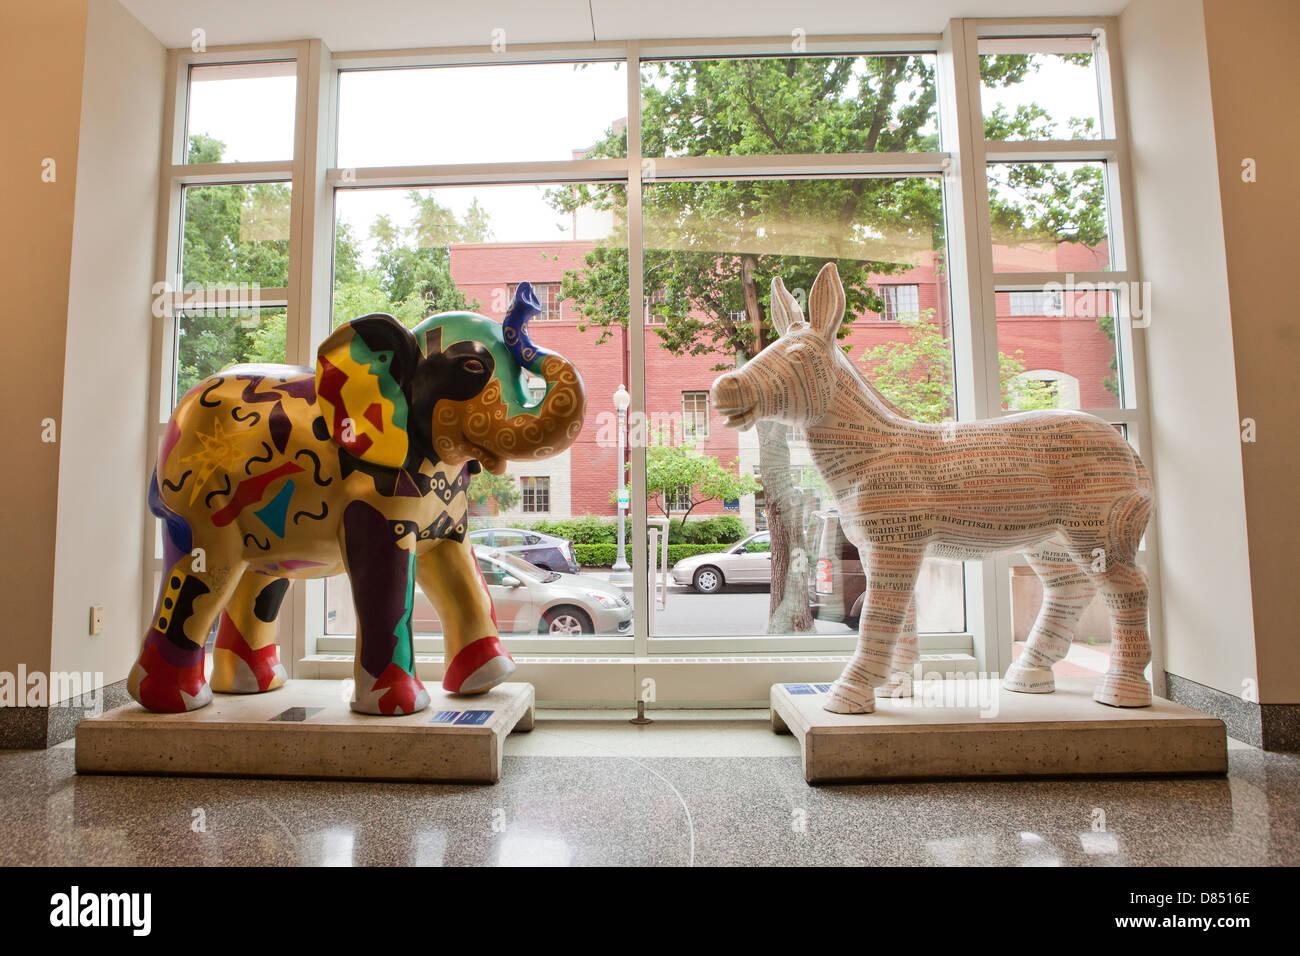 Democratic and Republican party mascots sculpture - Stock Image